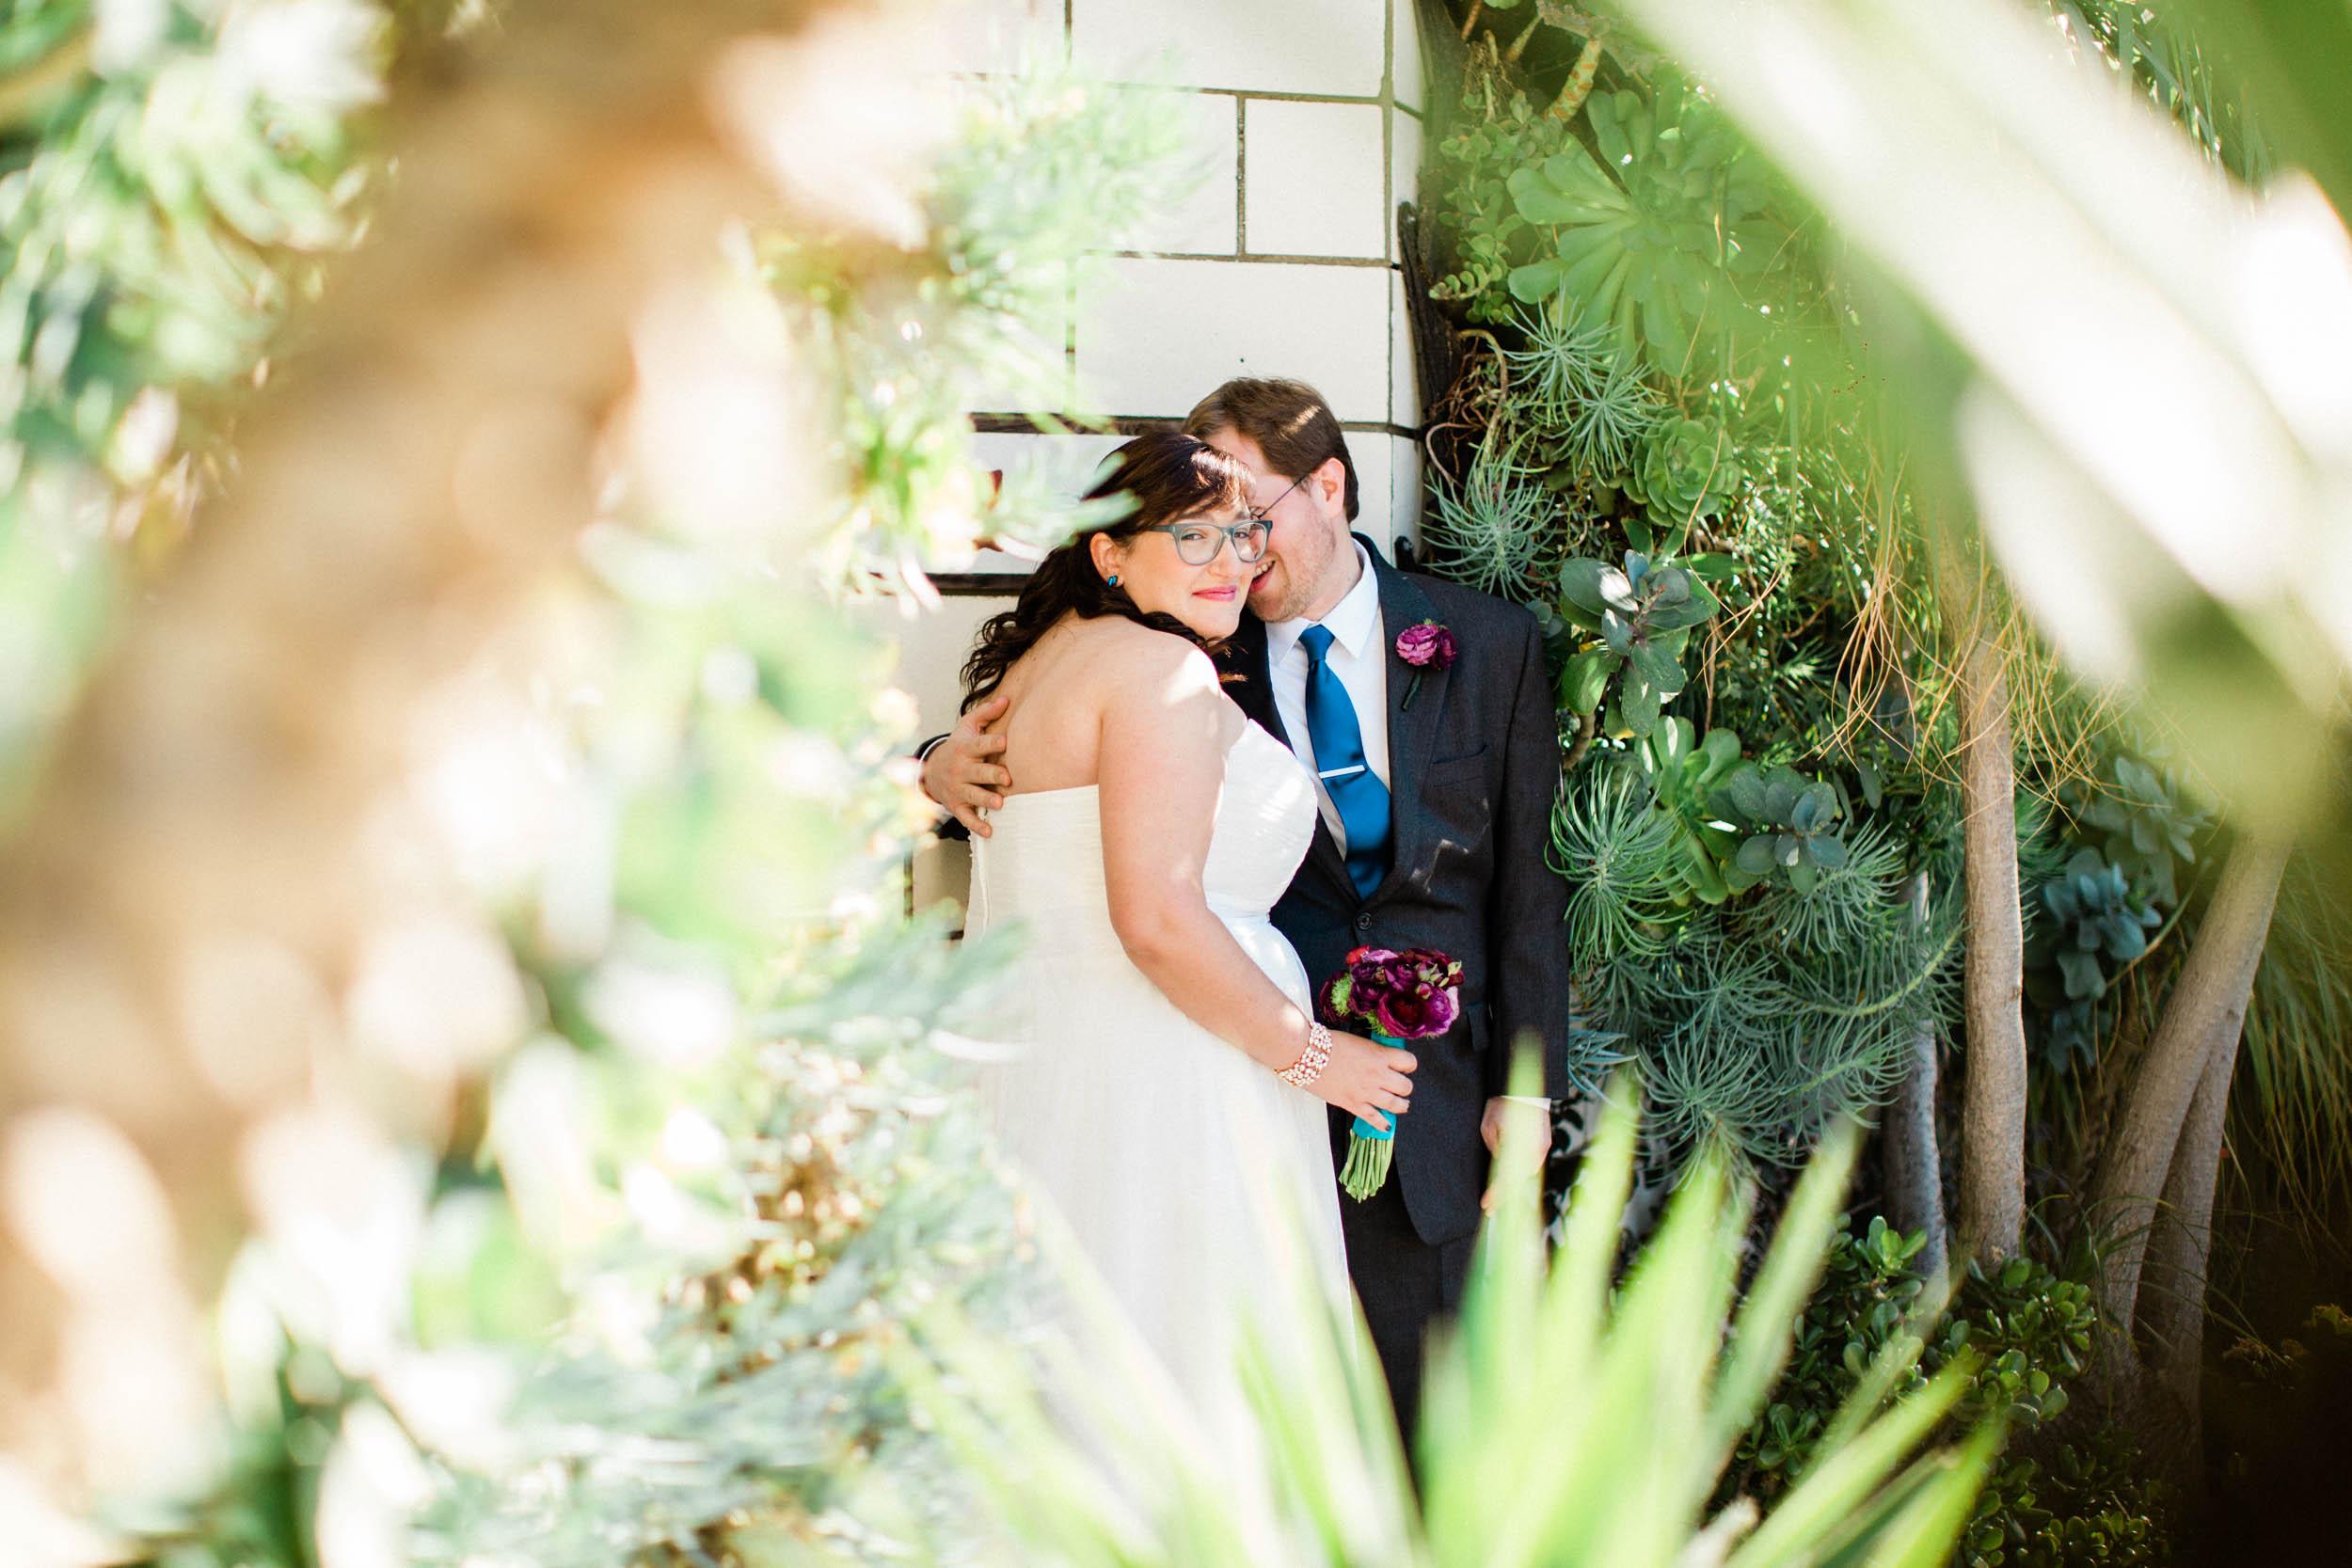 BKM-Photography-Smog-Shoppe-Culver-City-Wedding-Photographer-Culver-Hotel-0028.jpg